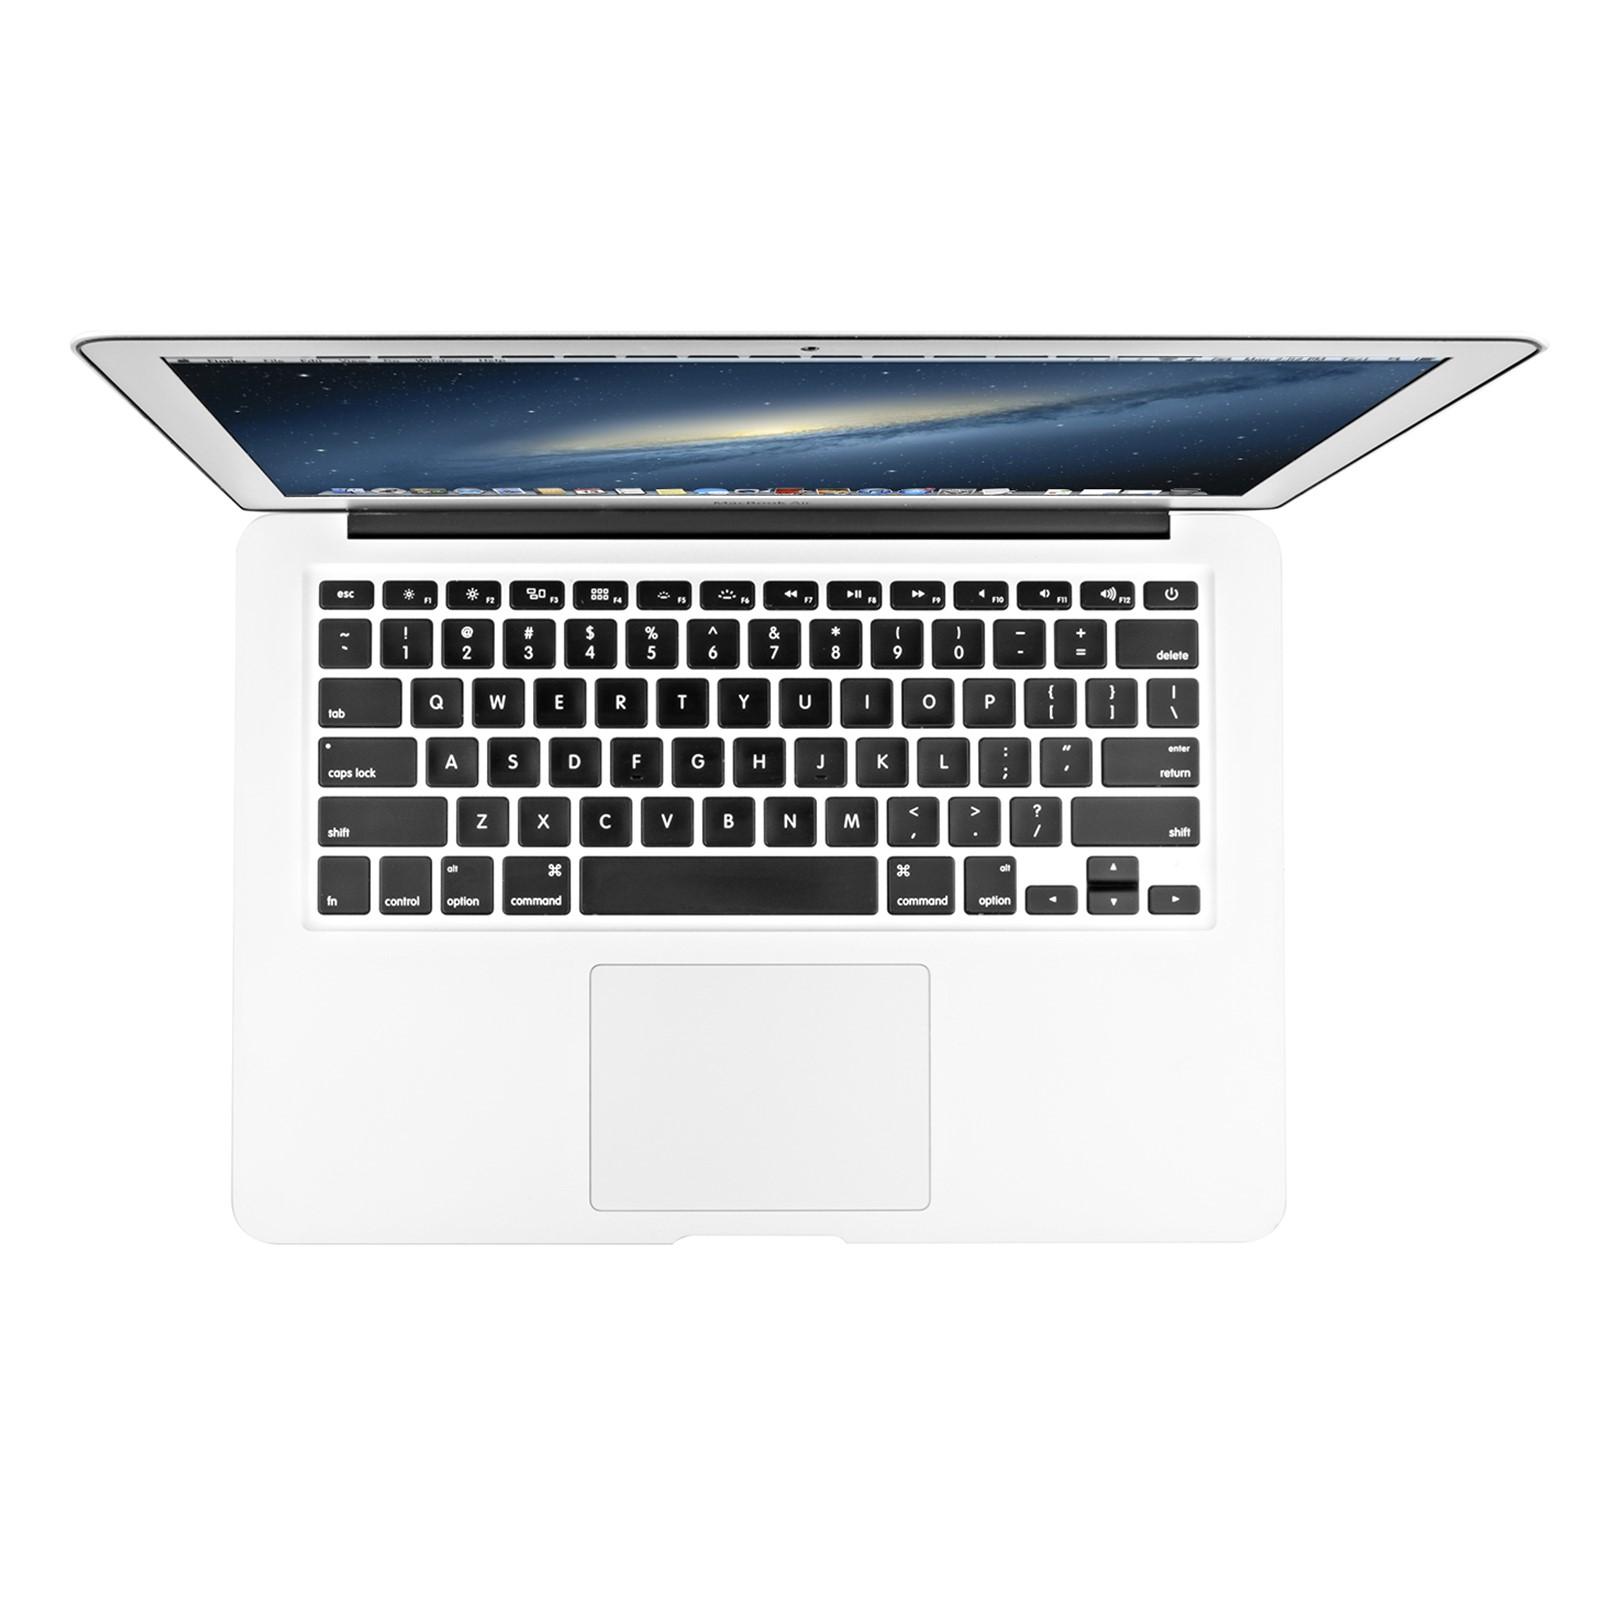 apple macbook air 13 1 3 ghz 128 gb ssd 4gb yosemite. Black Bedroom Furniture Sets. Home Design Ideas